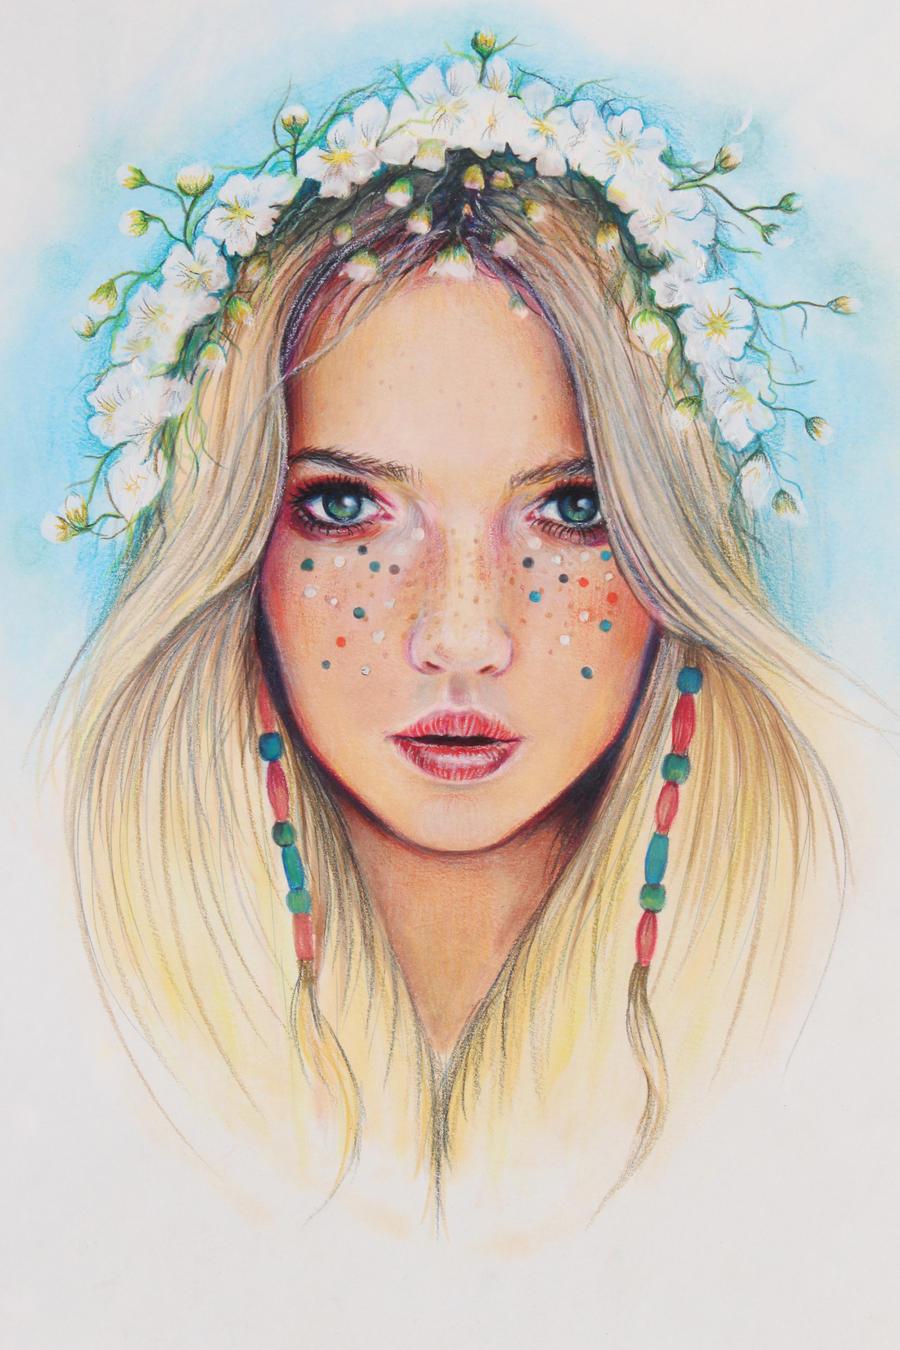 Hippie Chick by JoanneBarby on DeviantArt